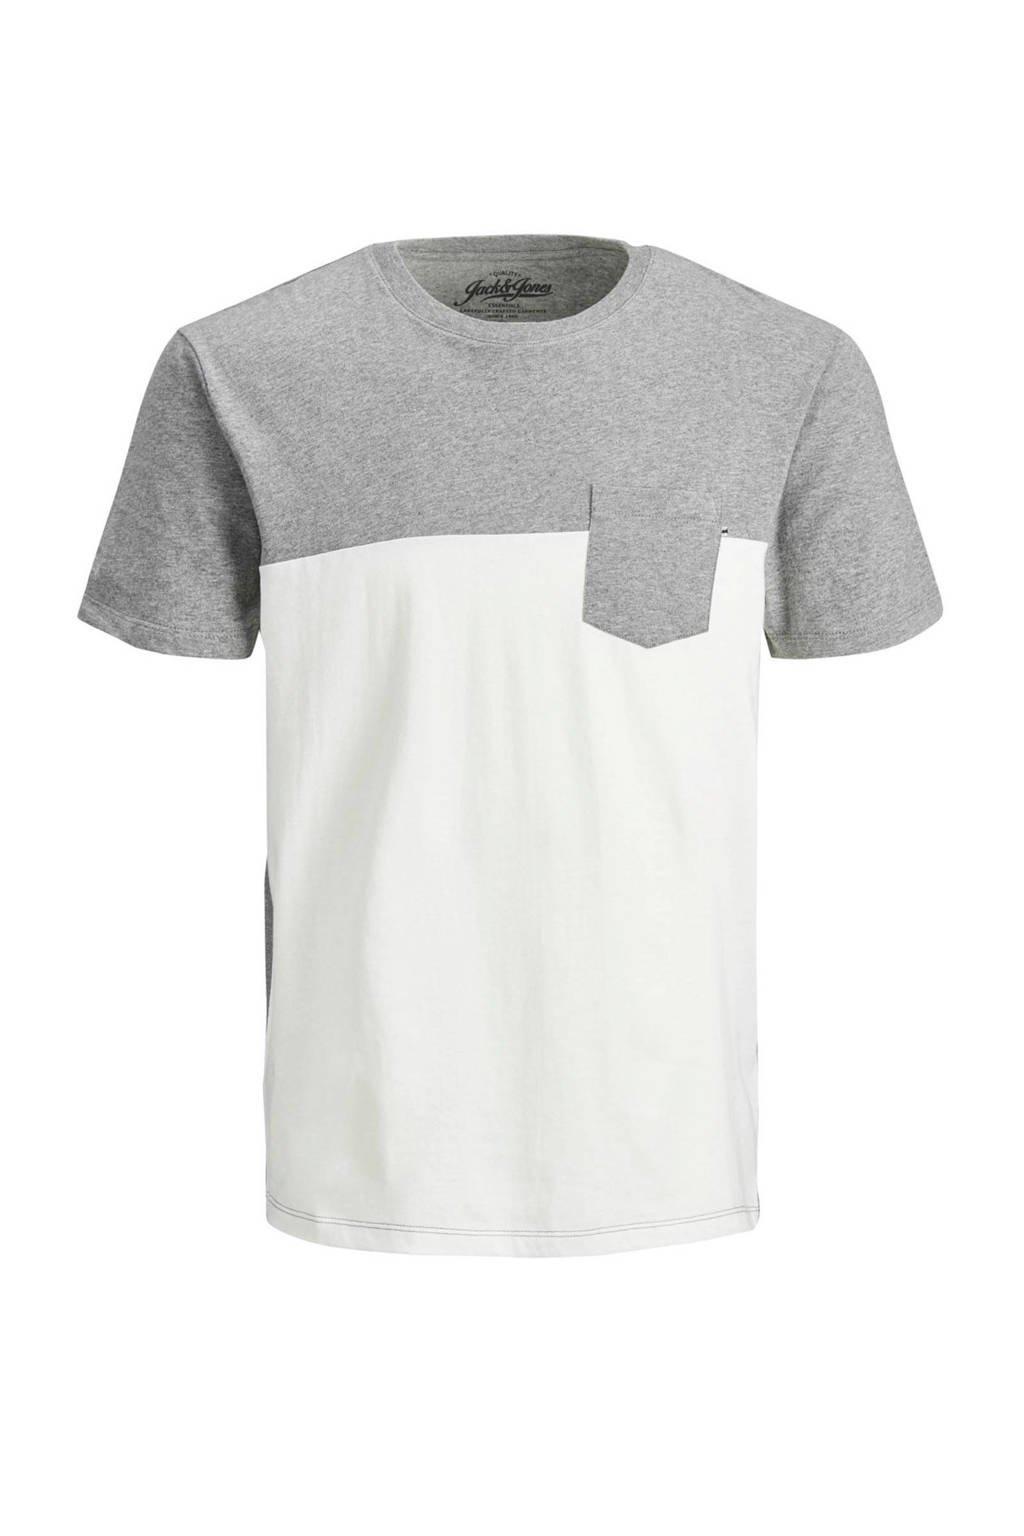 JACK & JONES JUNIOR T-shirt Mix wit, Wit